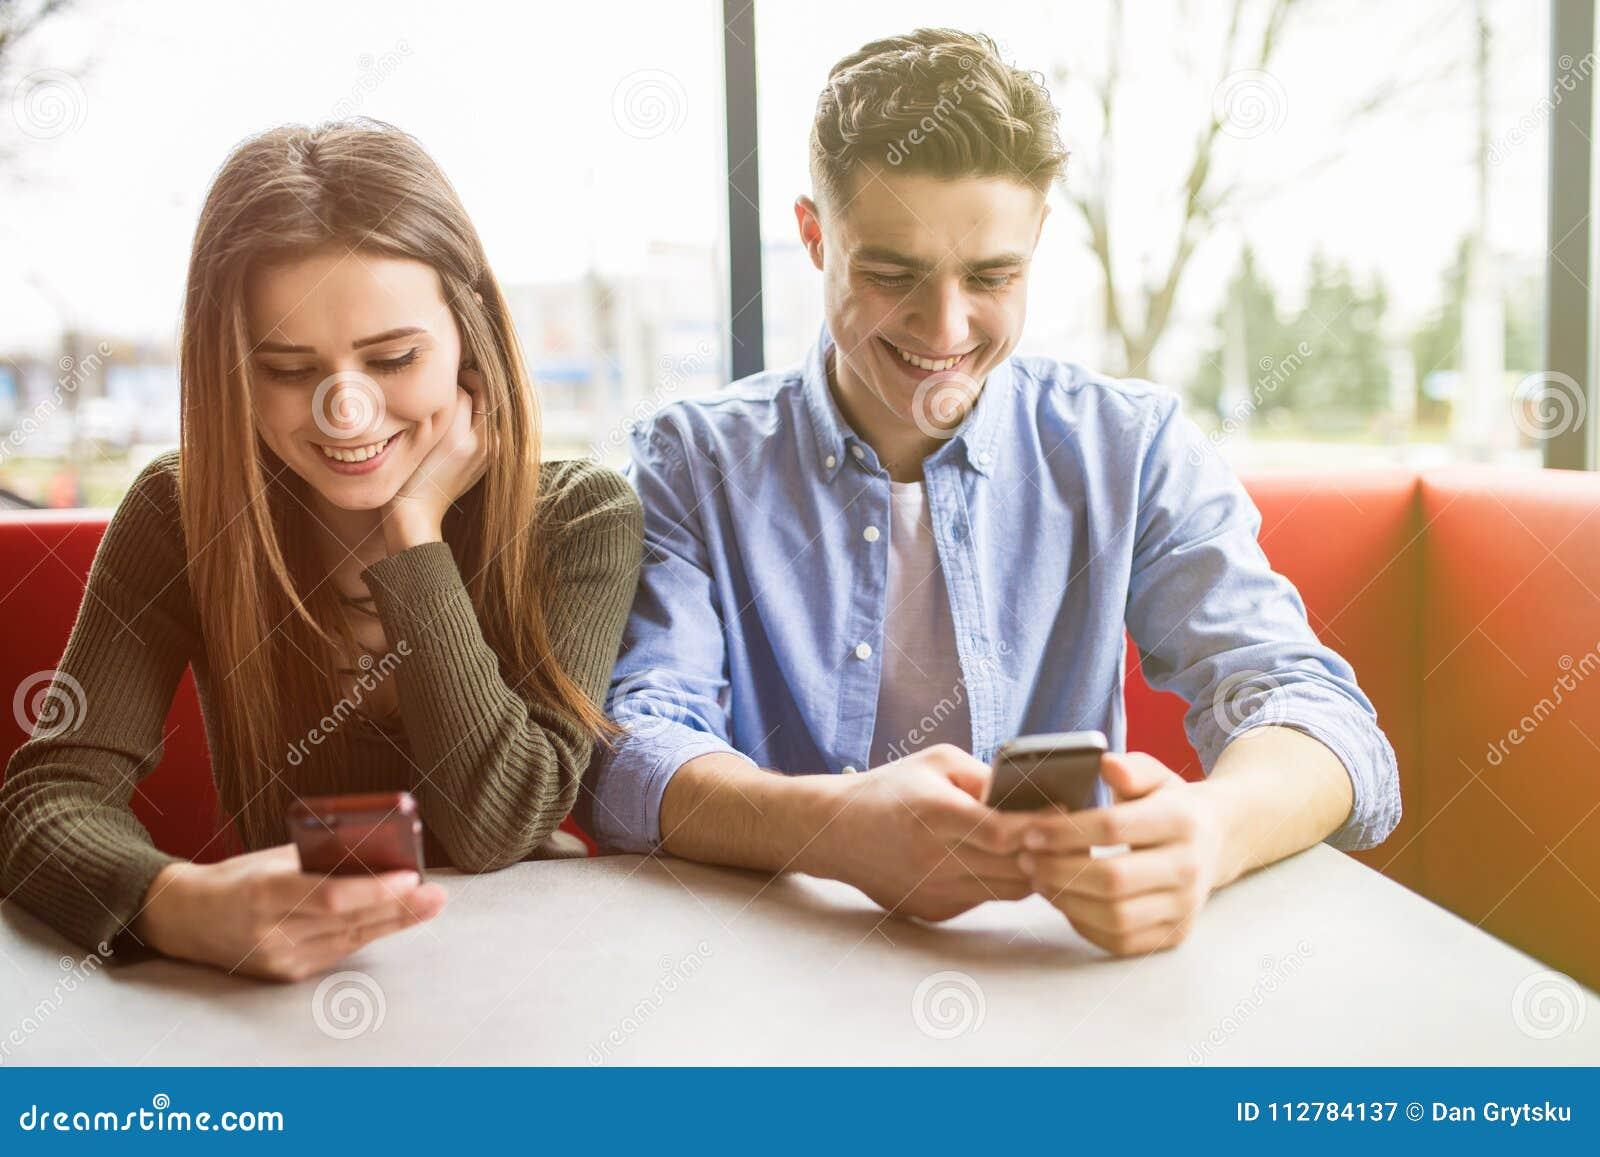 nice dating